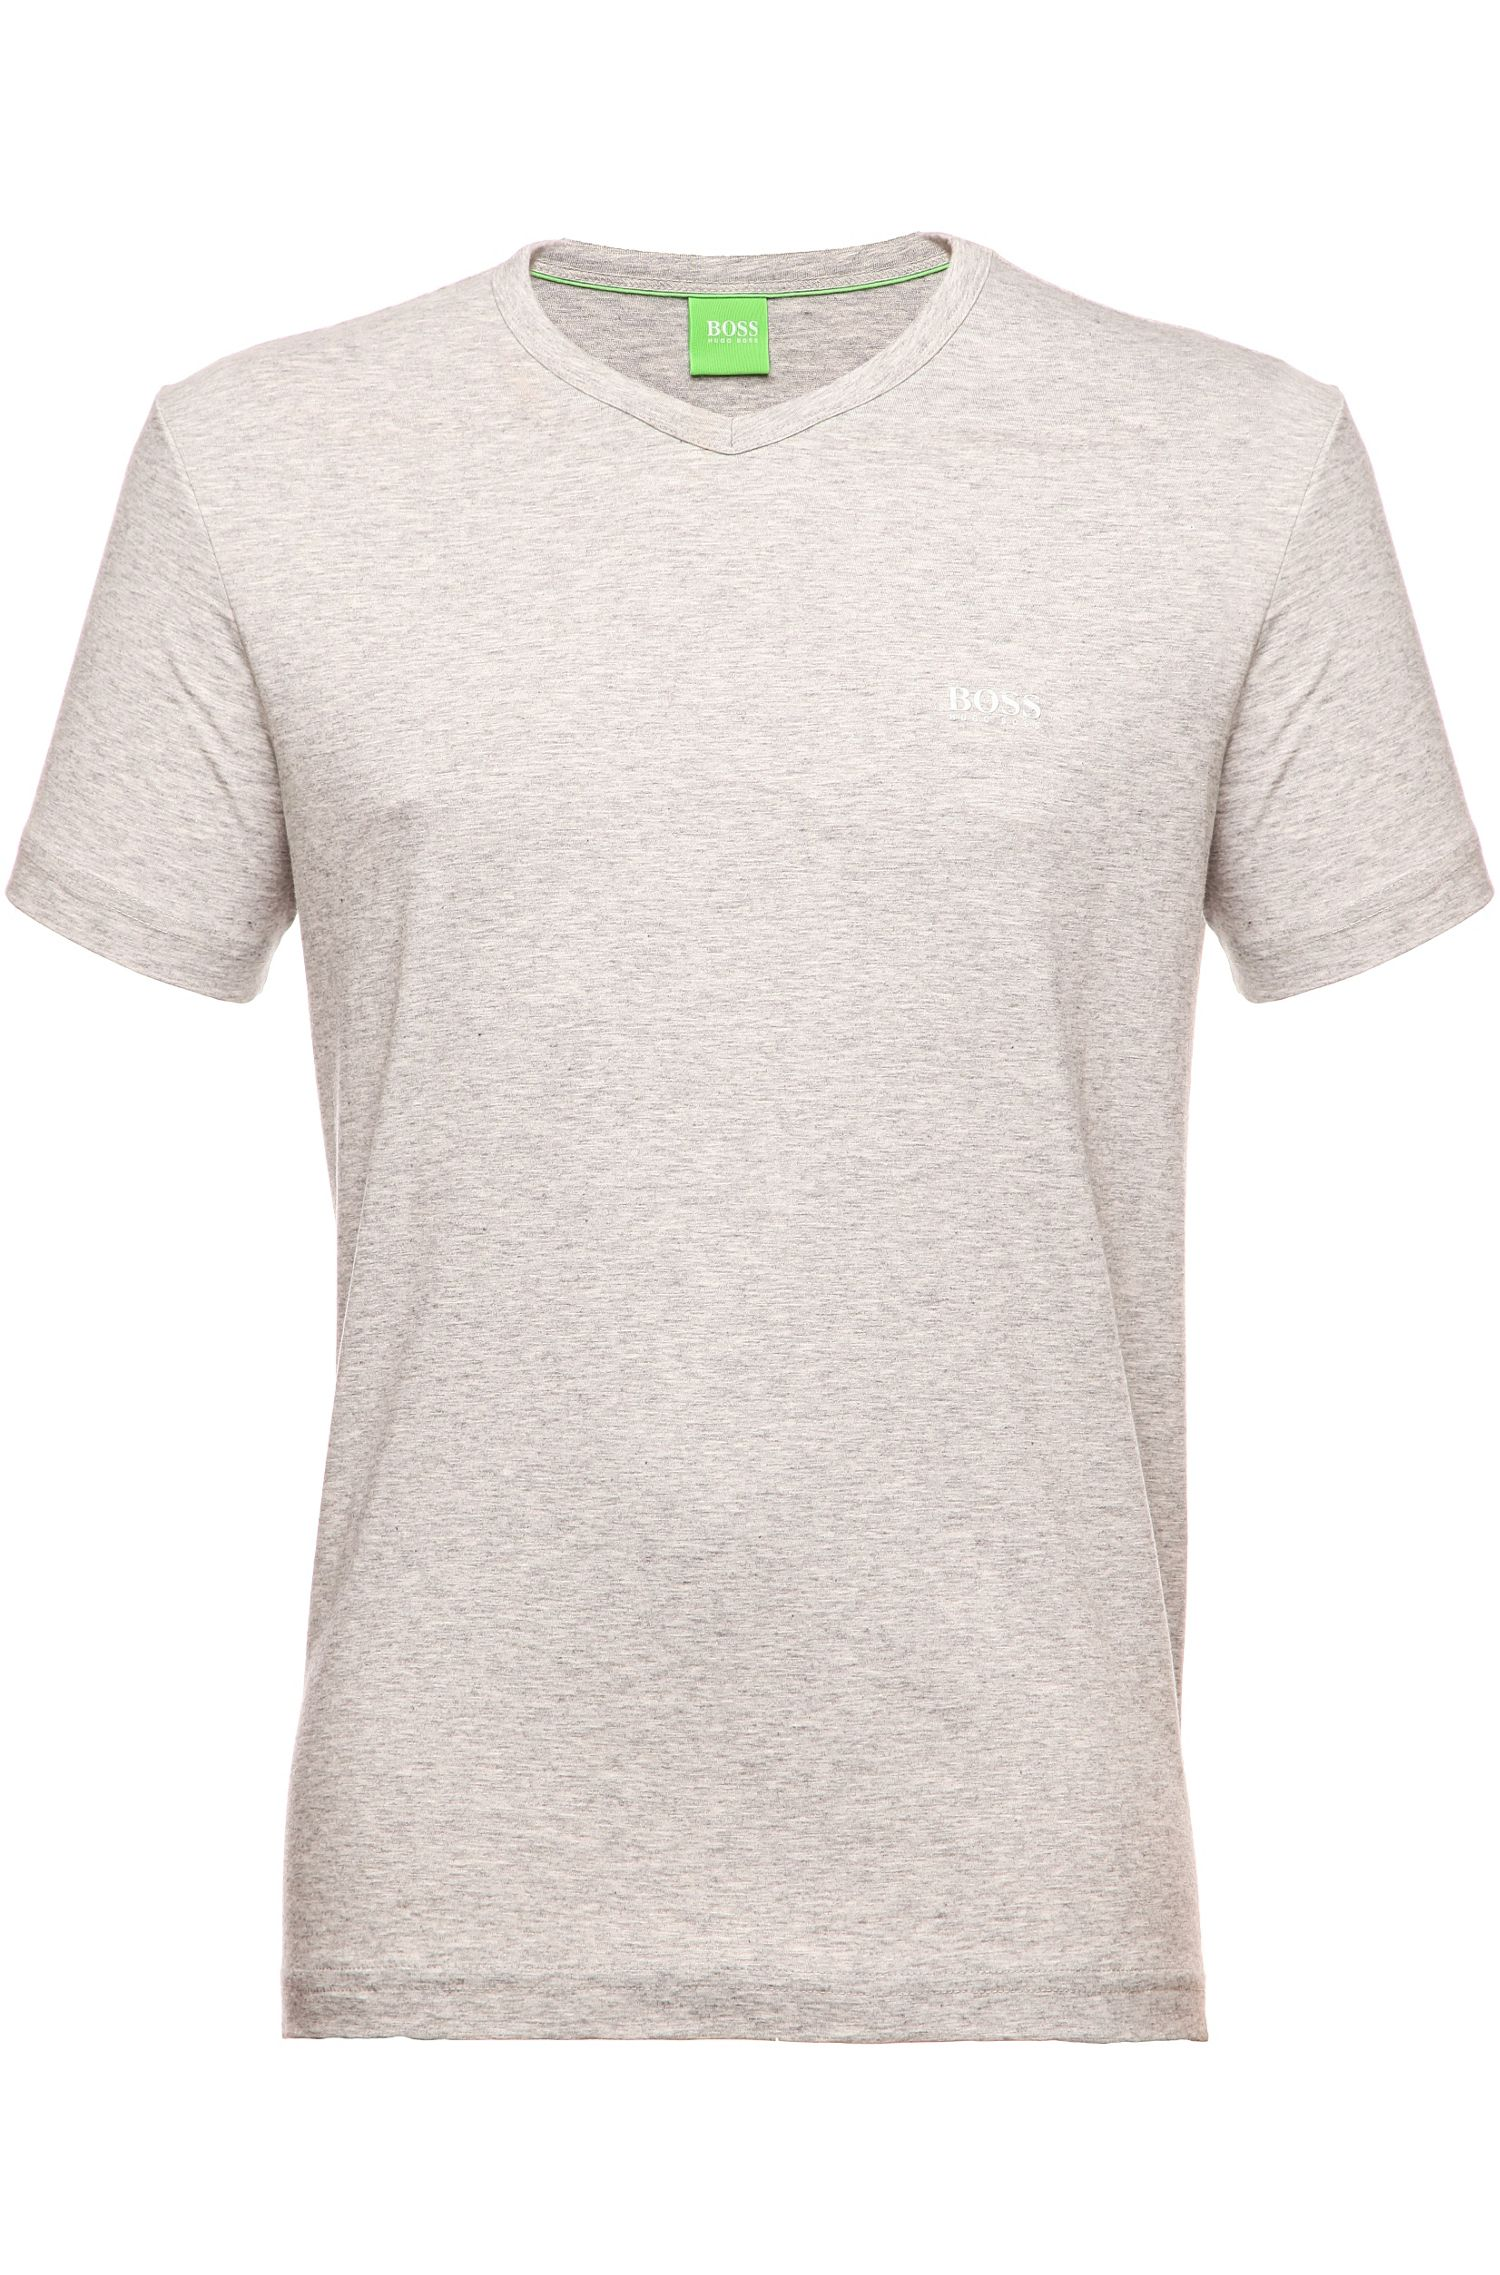 Regular-Fit T-Shirt aus Baumwolle mit V-Ausschnitt: ´Teevn`